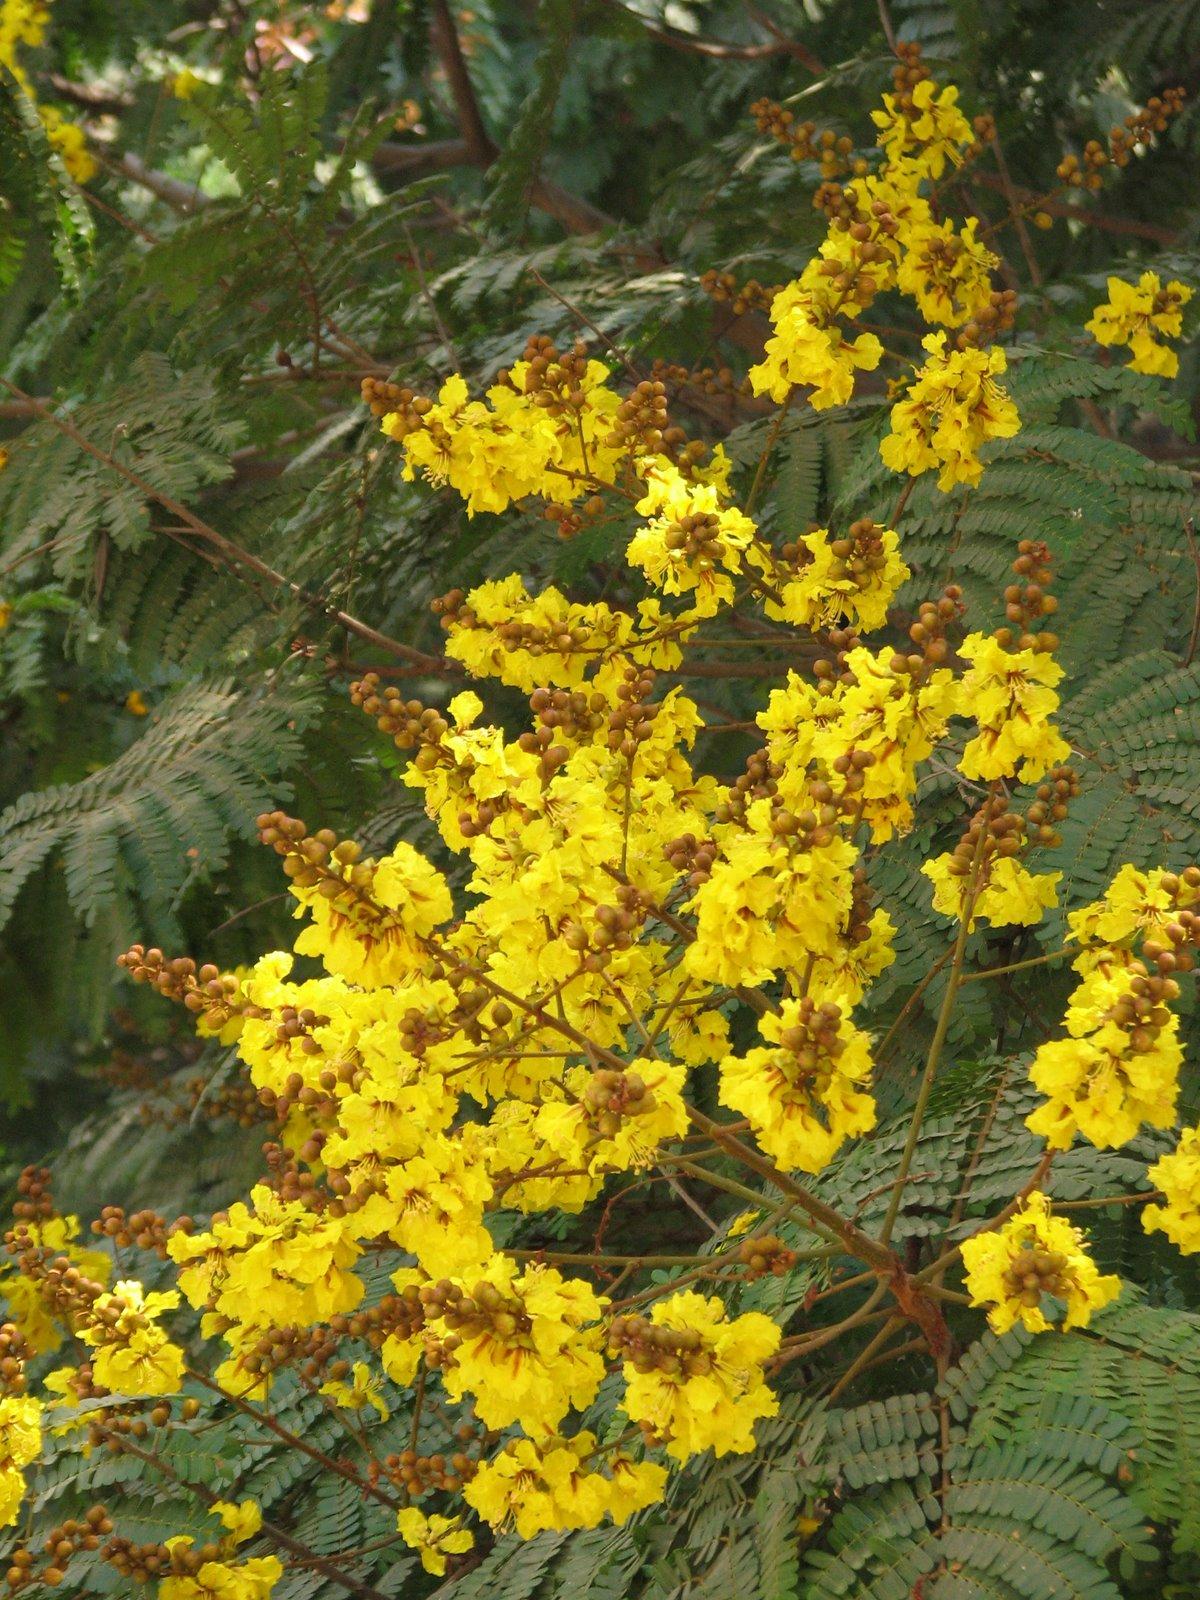 The grey nomads forum peltophorumpterocarpum yellowflametree252ccopperpodg mightylinksfo